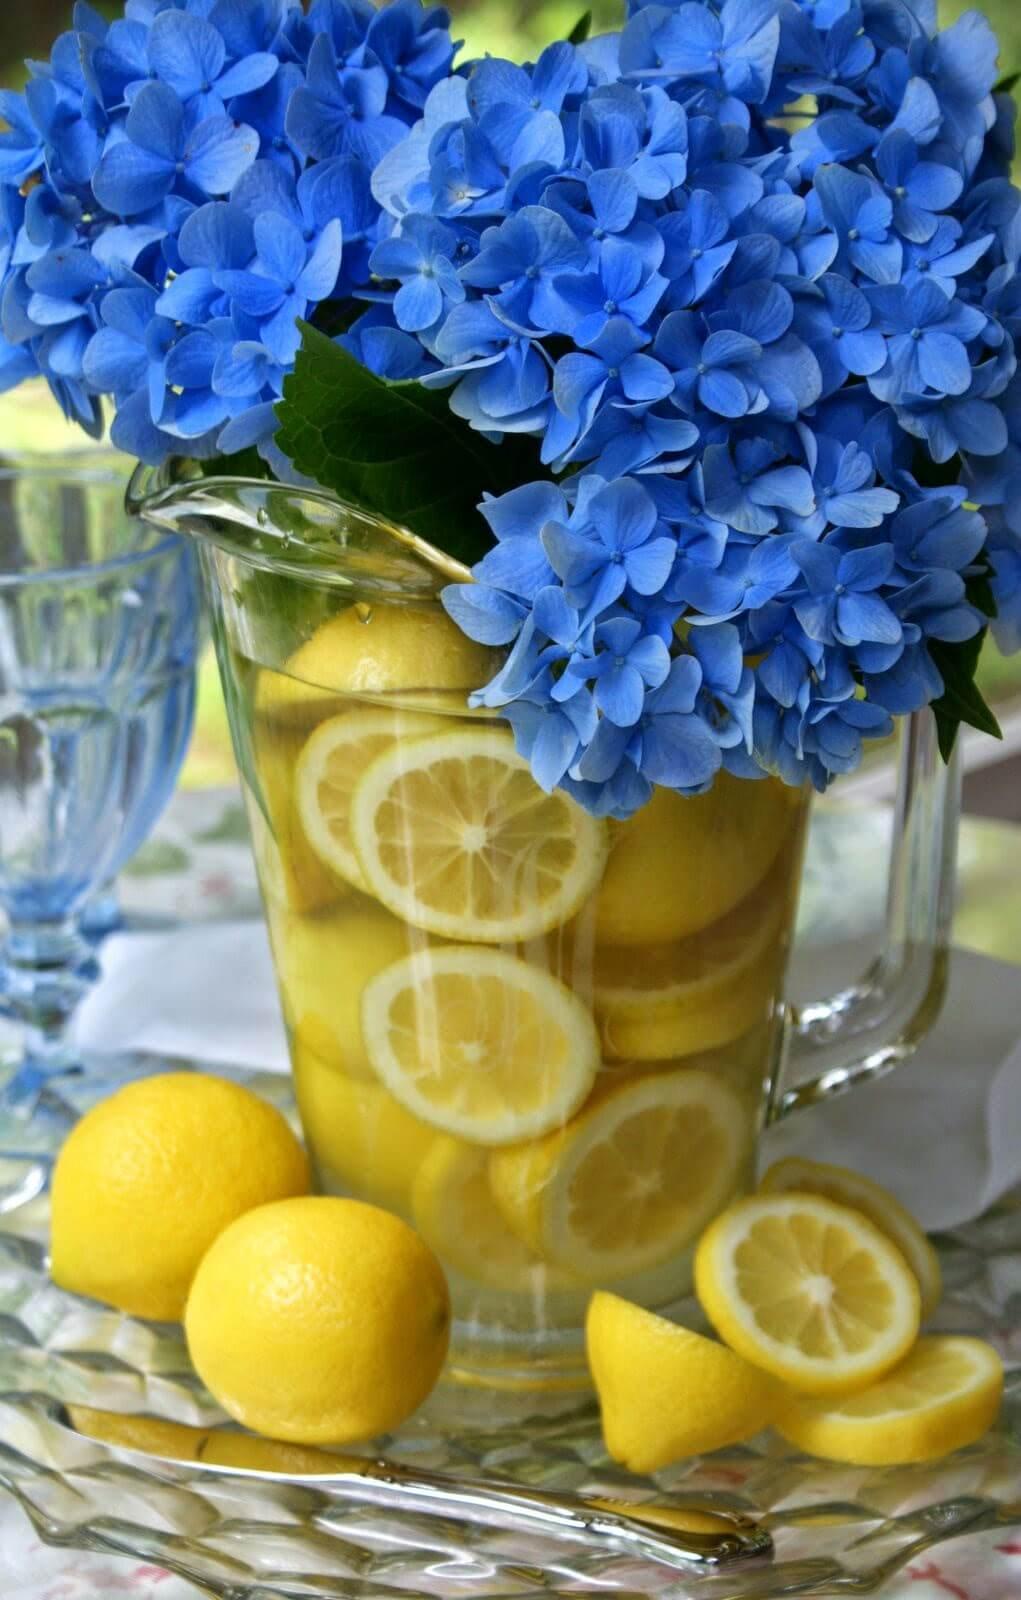 Zesty Lemon Pitcher Summer Flower Vase